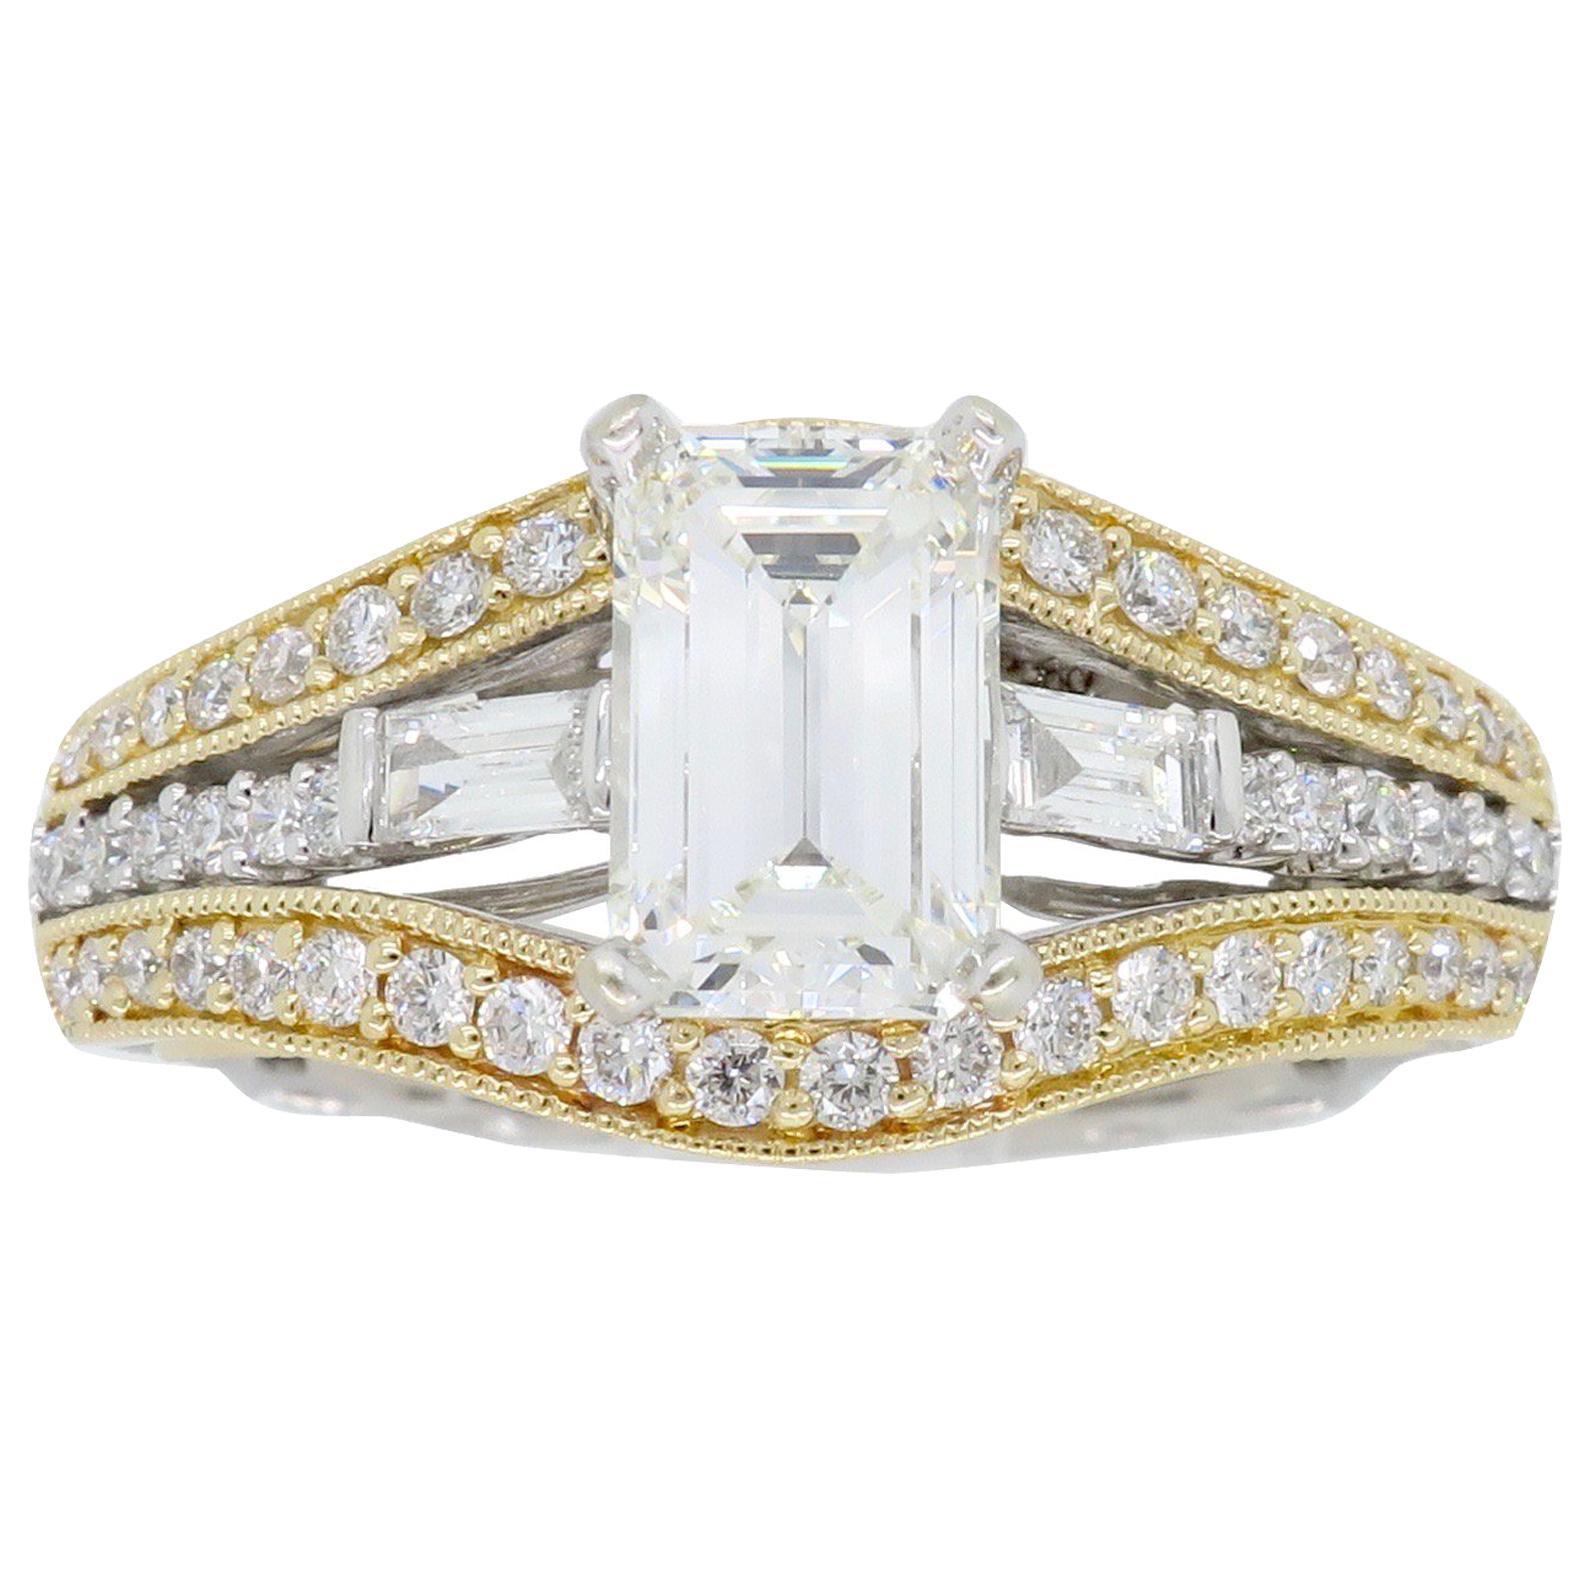 1.50 Carat Emerald Cut Diamond Ring